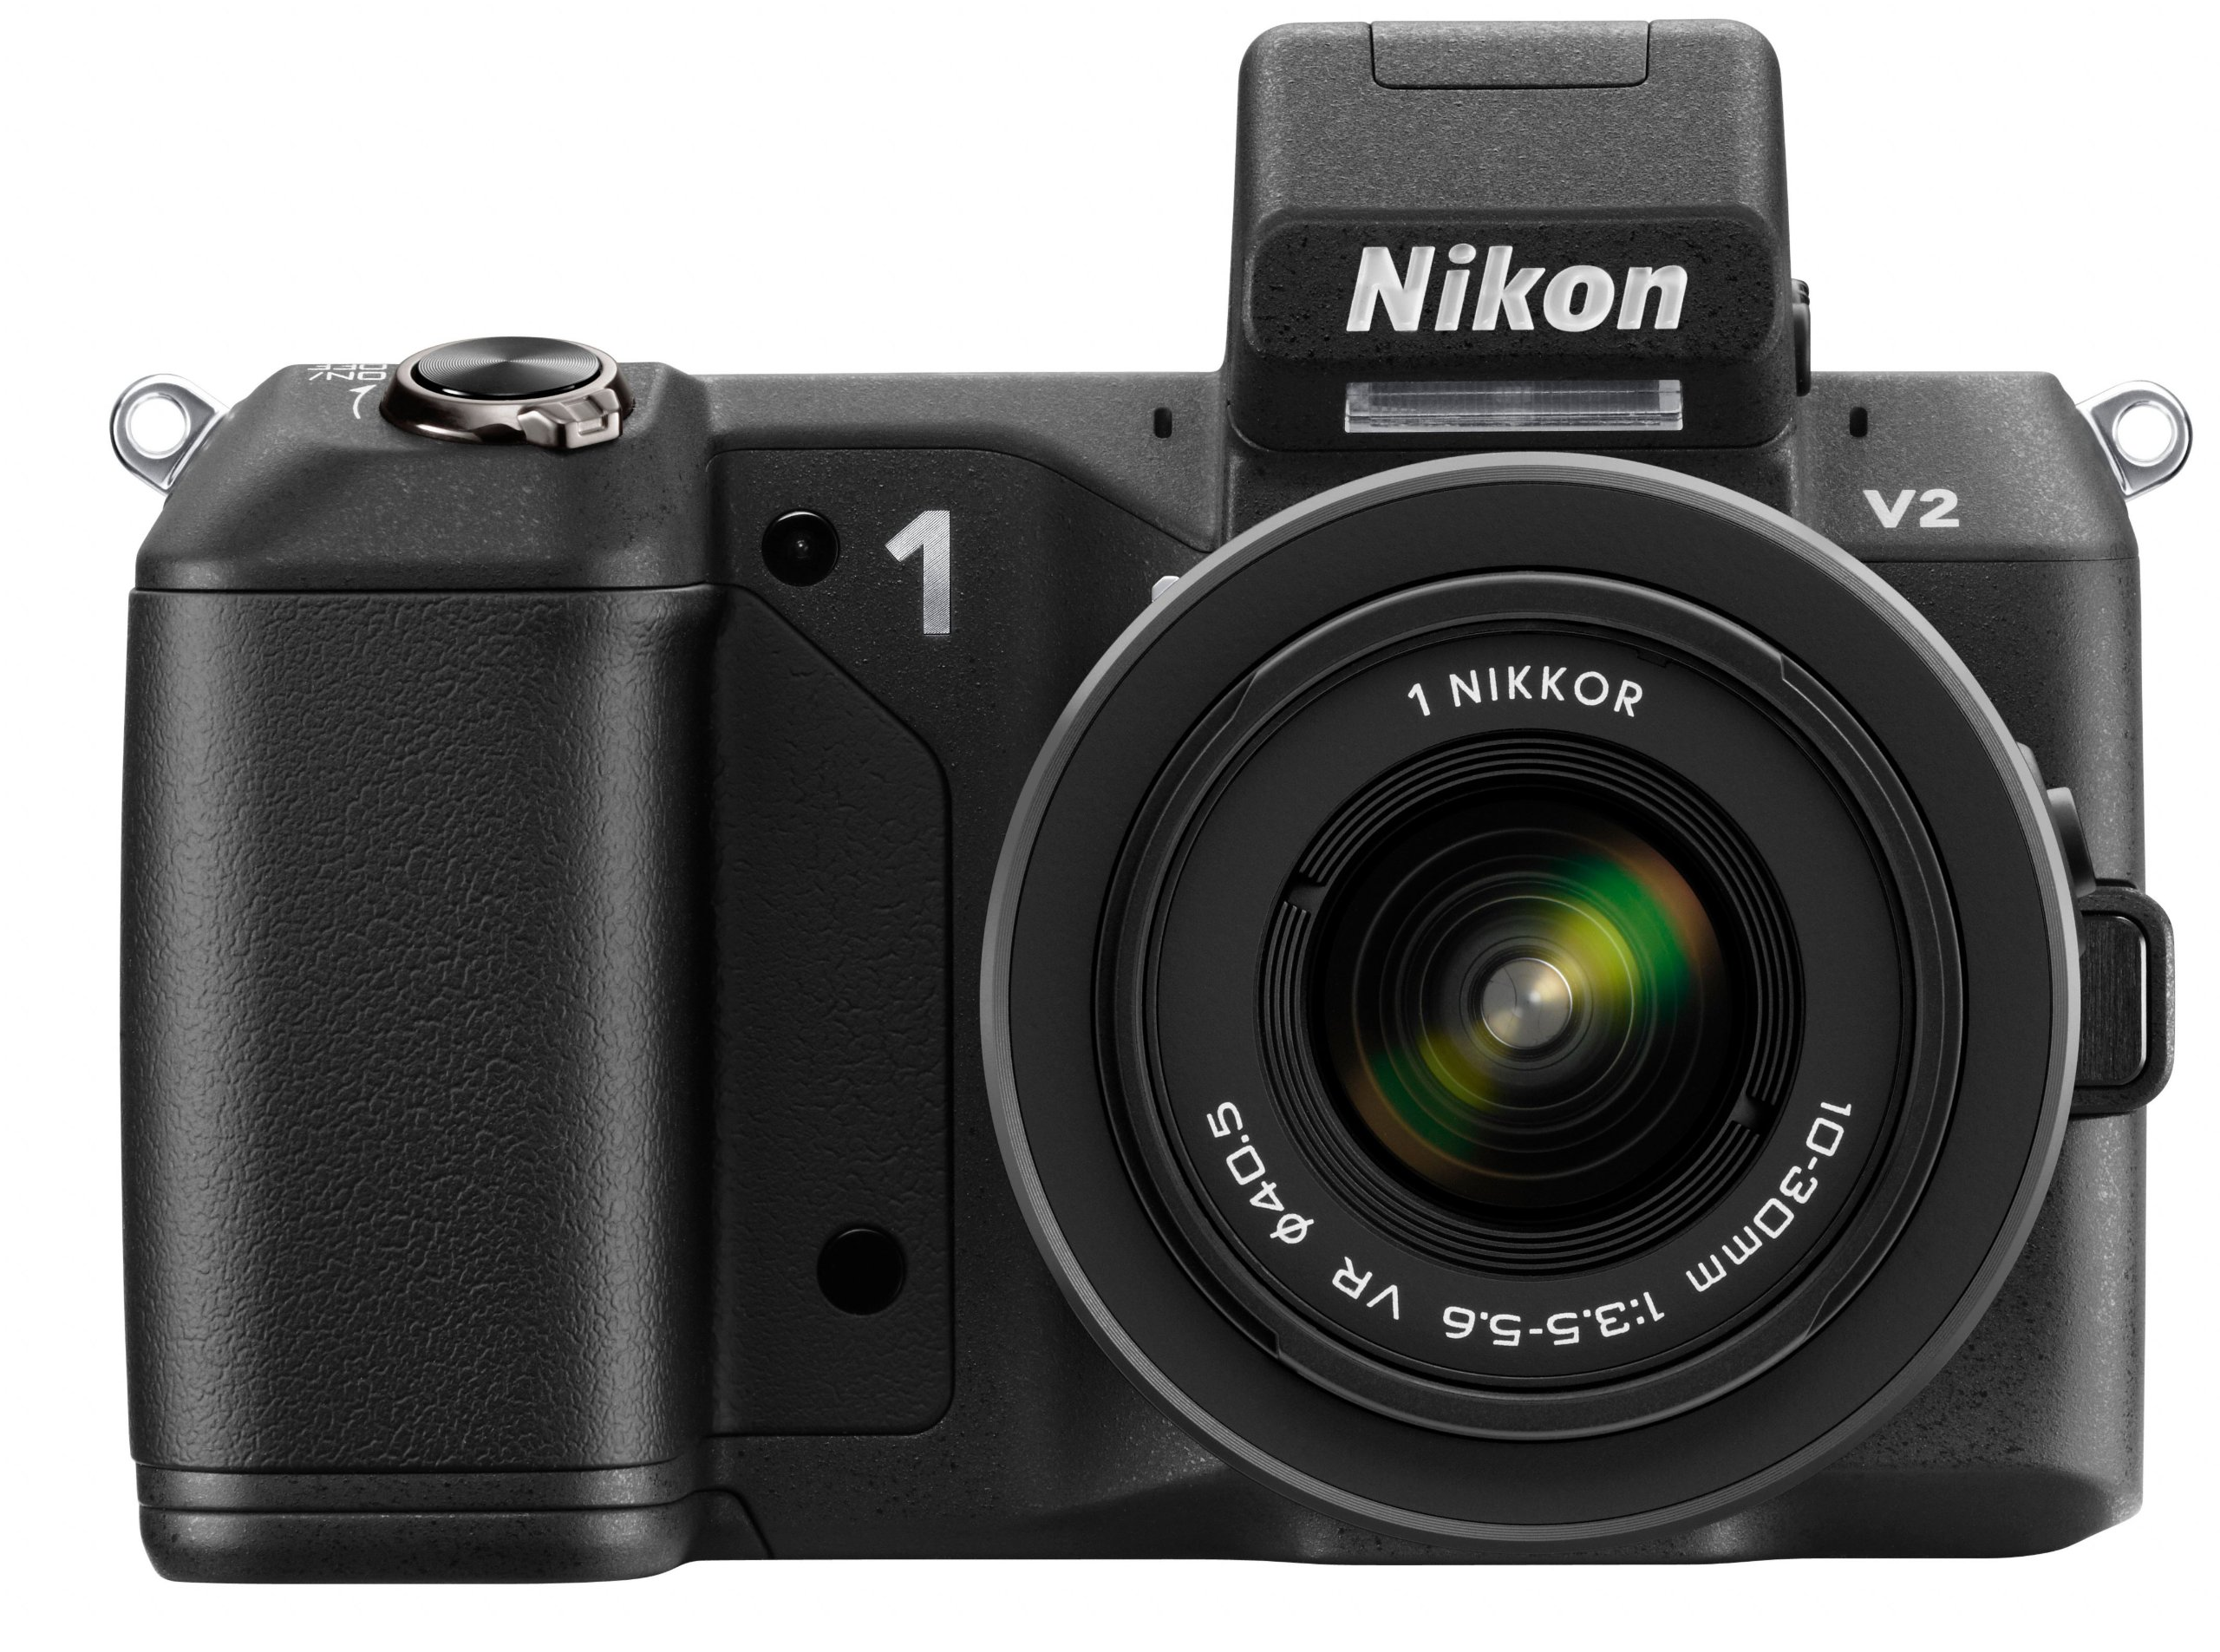 Nikon Mirrorless Interchangeable Lens Camera with 1 NIKKOR VR 10-30mm f/3.5-5.6 - International Version